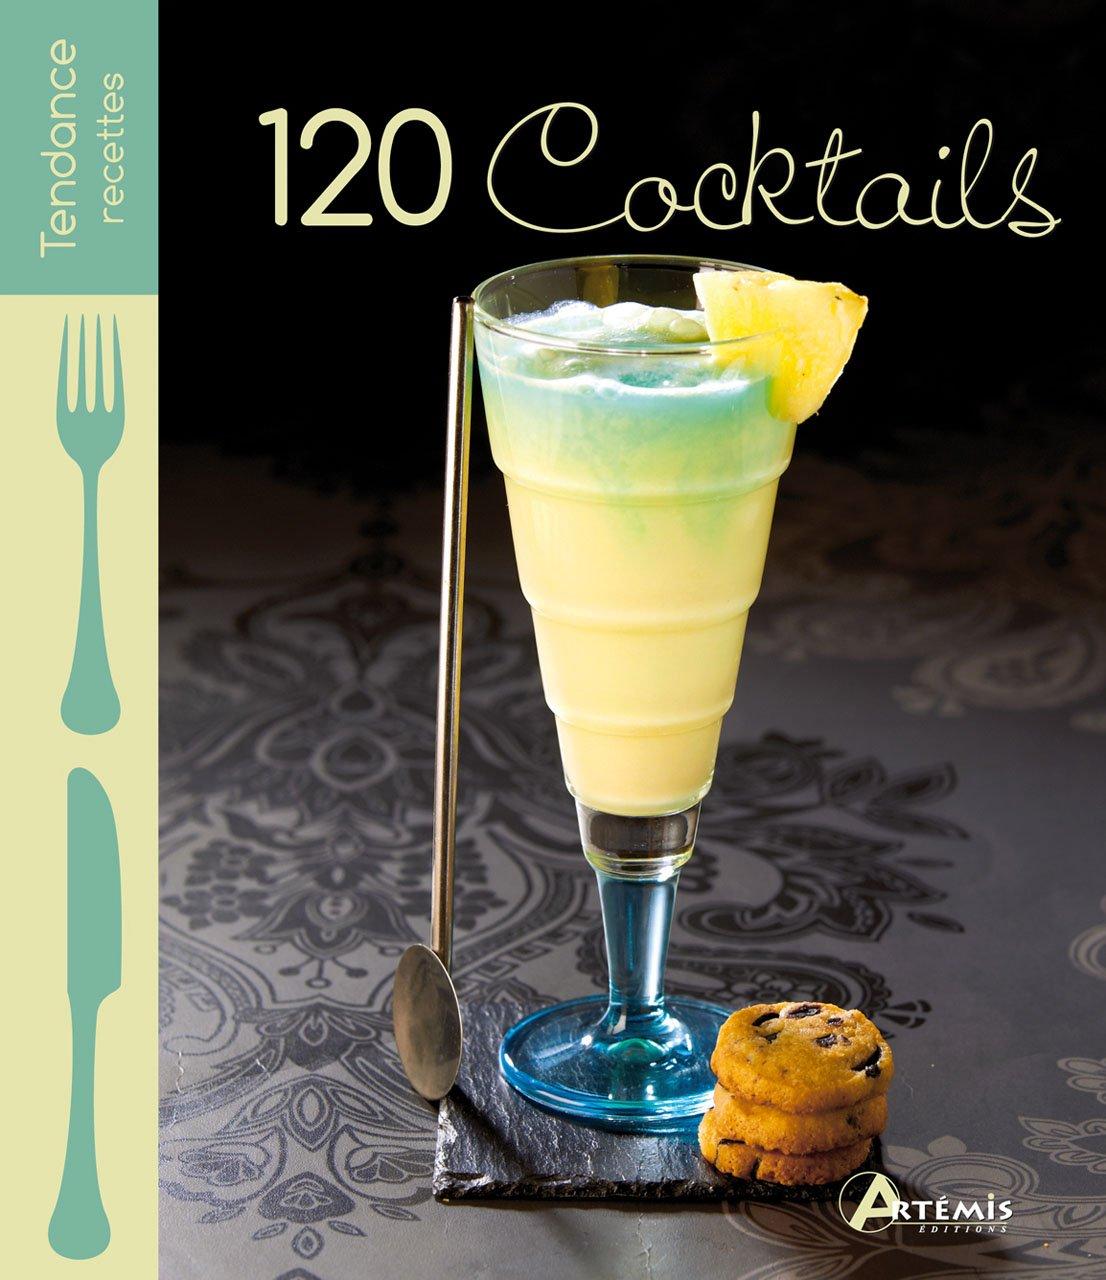 120 cocktails